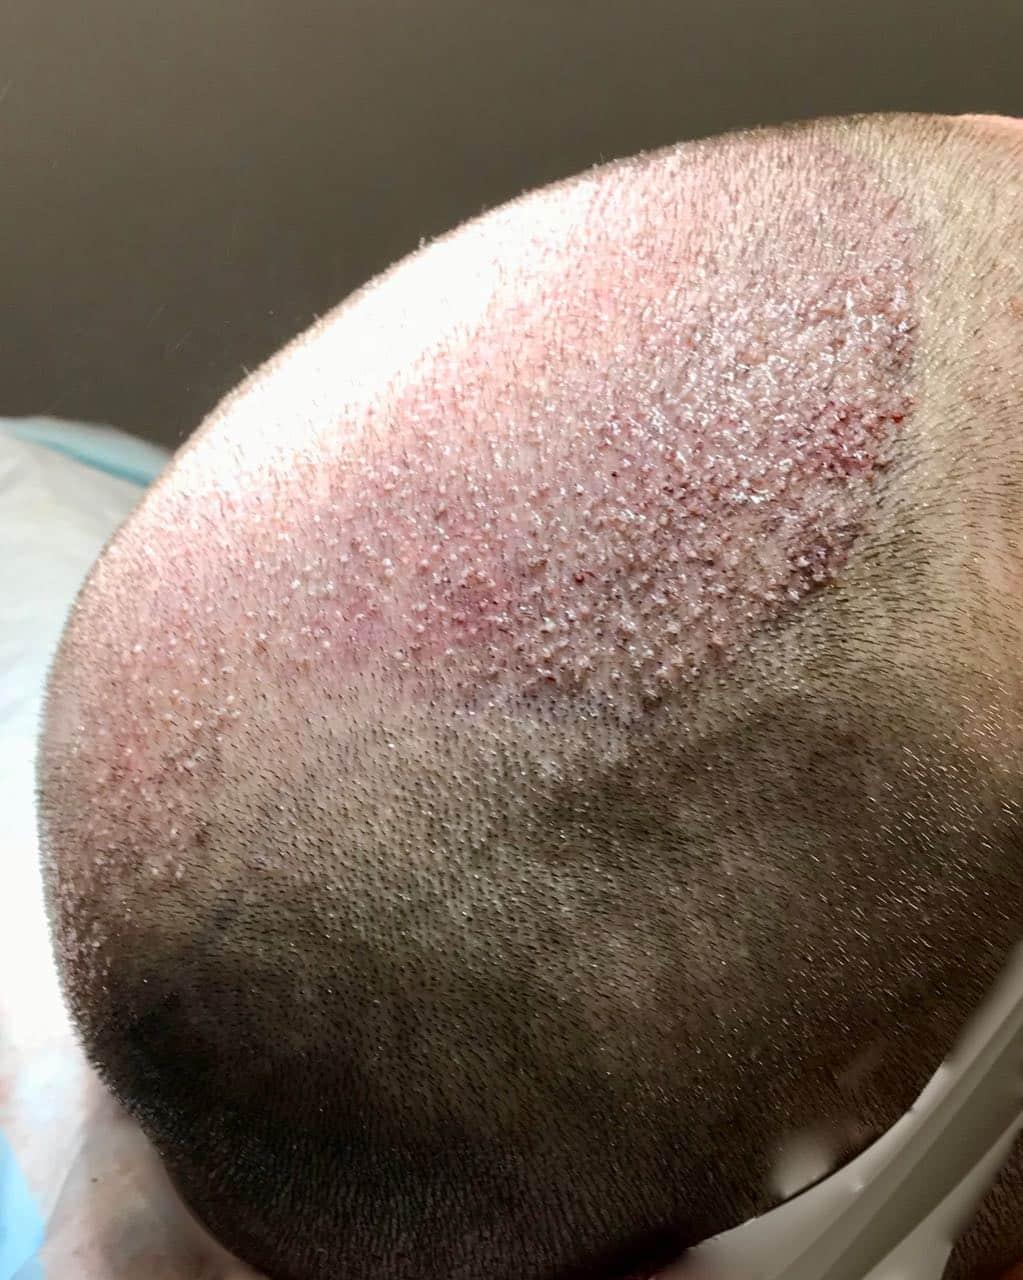 FUE FUT, FUE FUT Transplant, Holborn Hair & Scalp Clinic